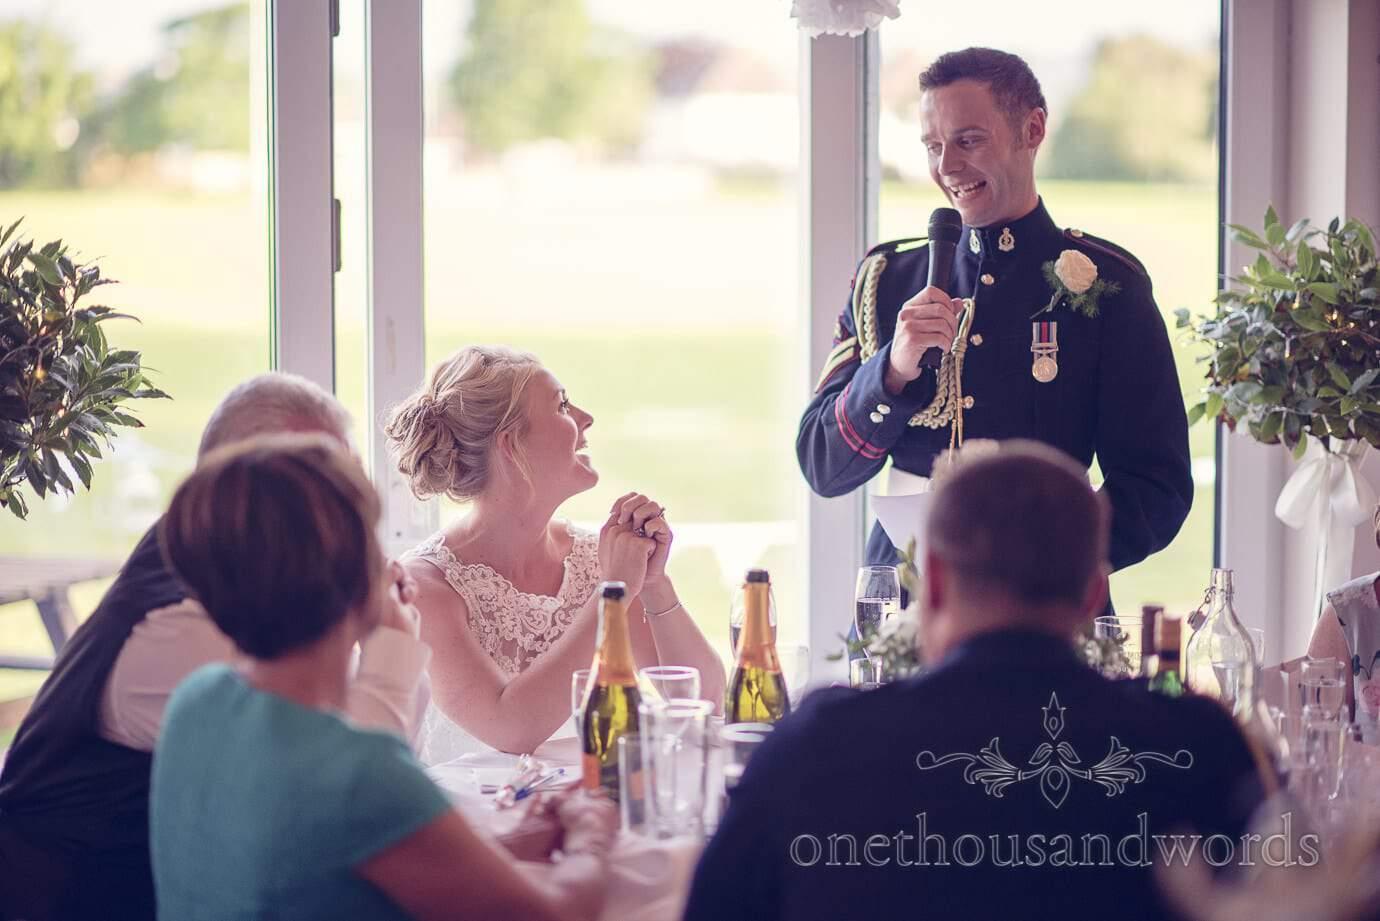 Groom's wedding speech in military uniform at Wareham Rugby Club wedding